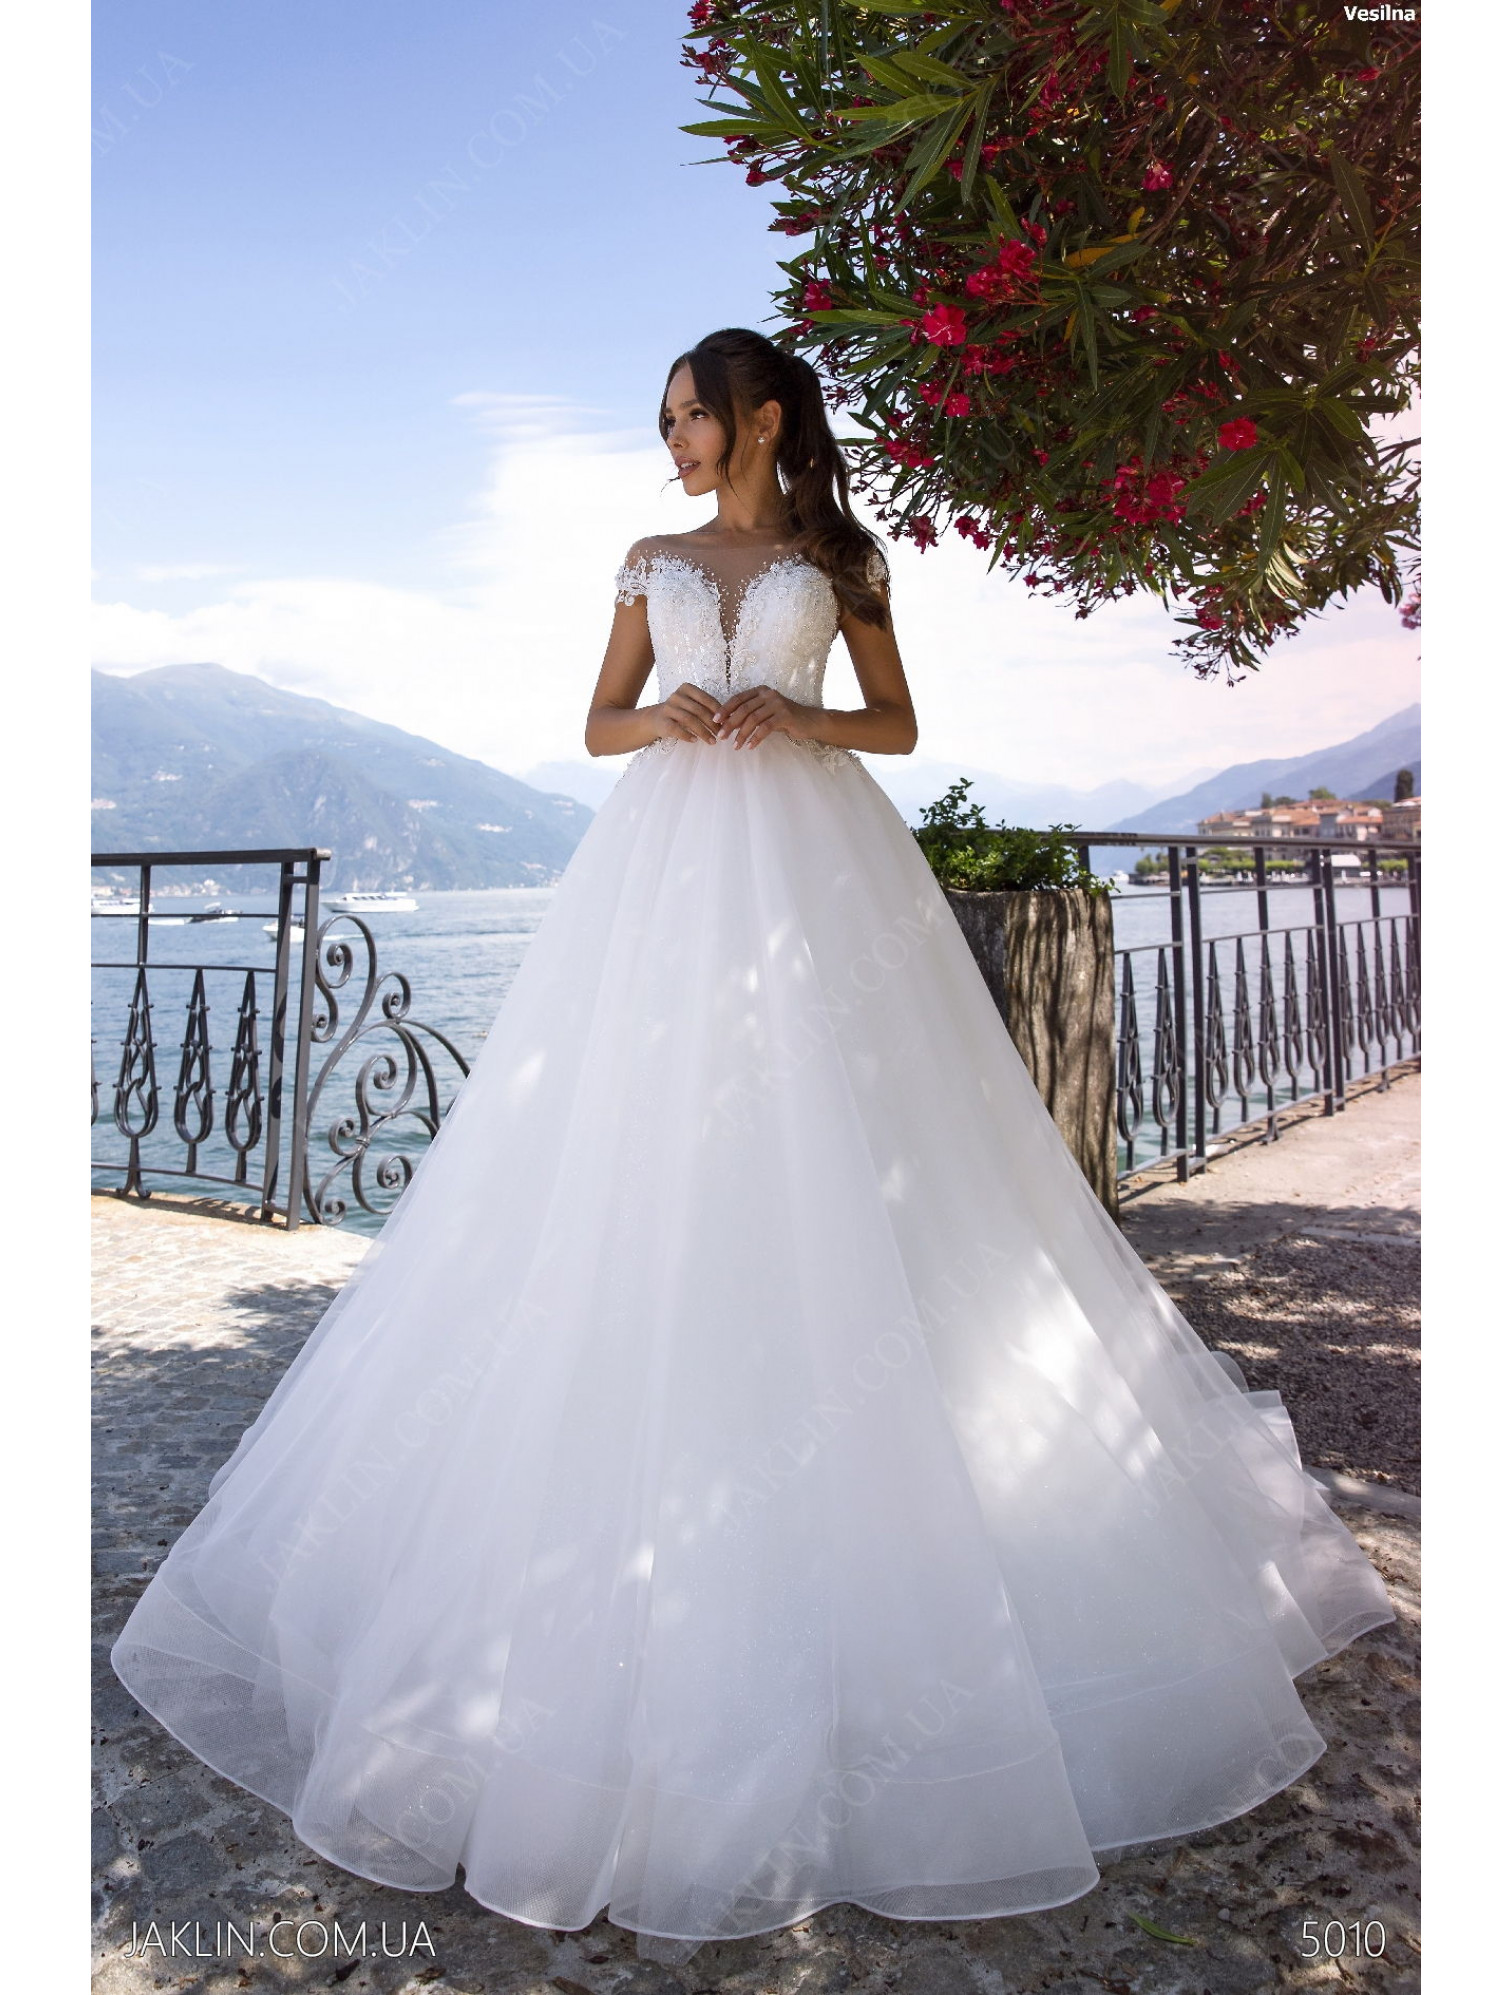 Wedding dress 5010